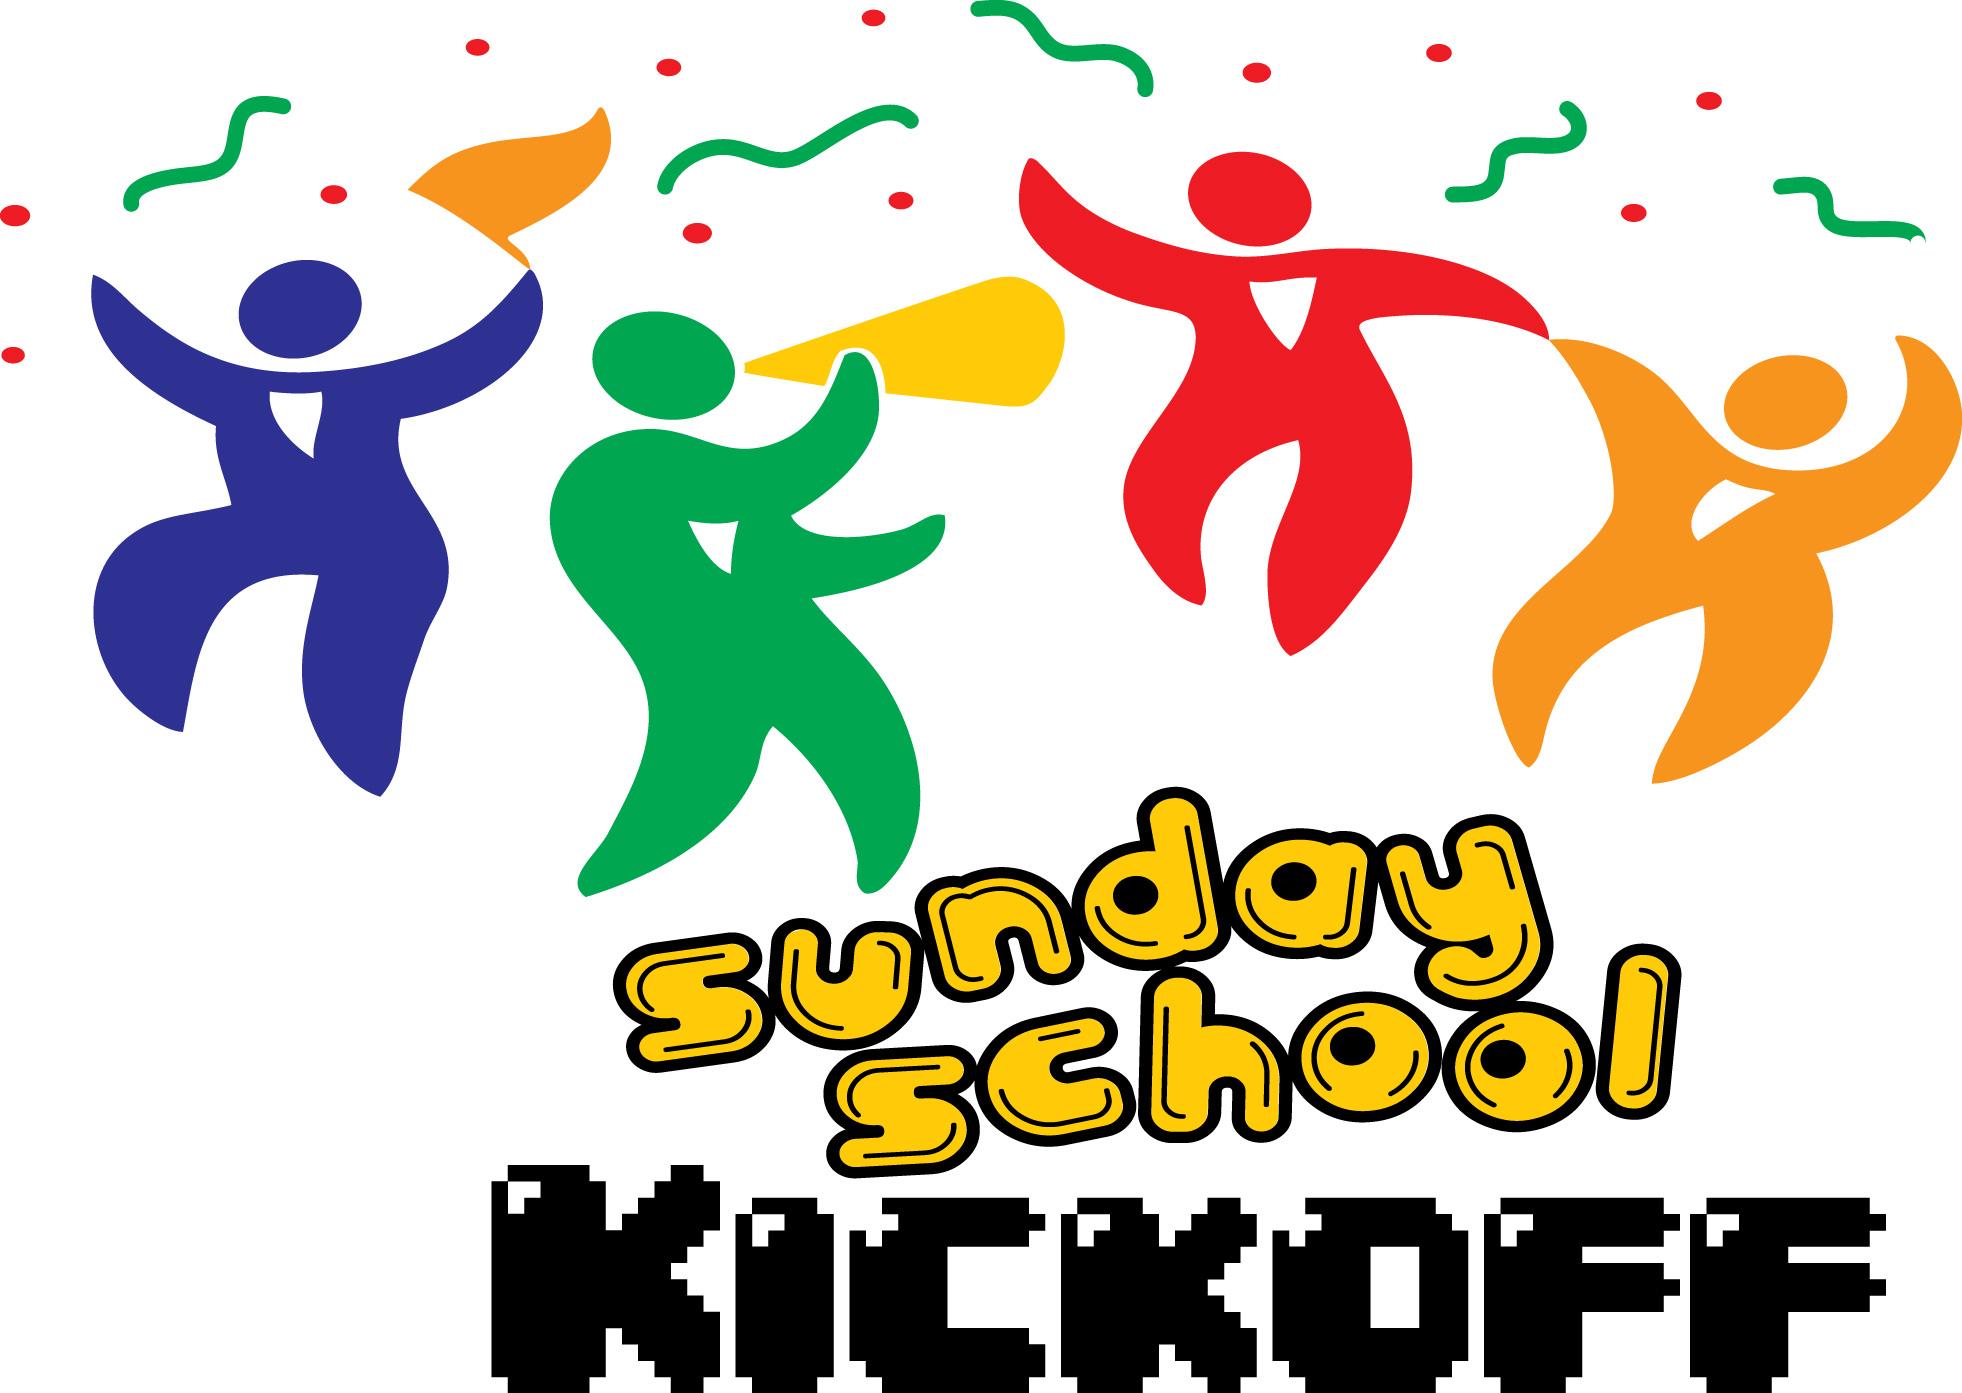 Sunday School Clipart Best